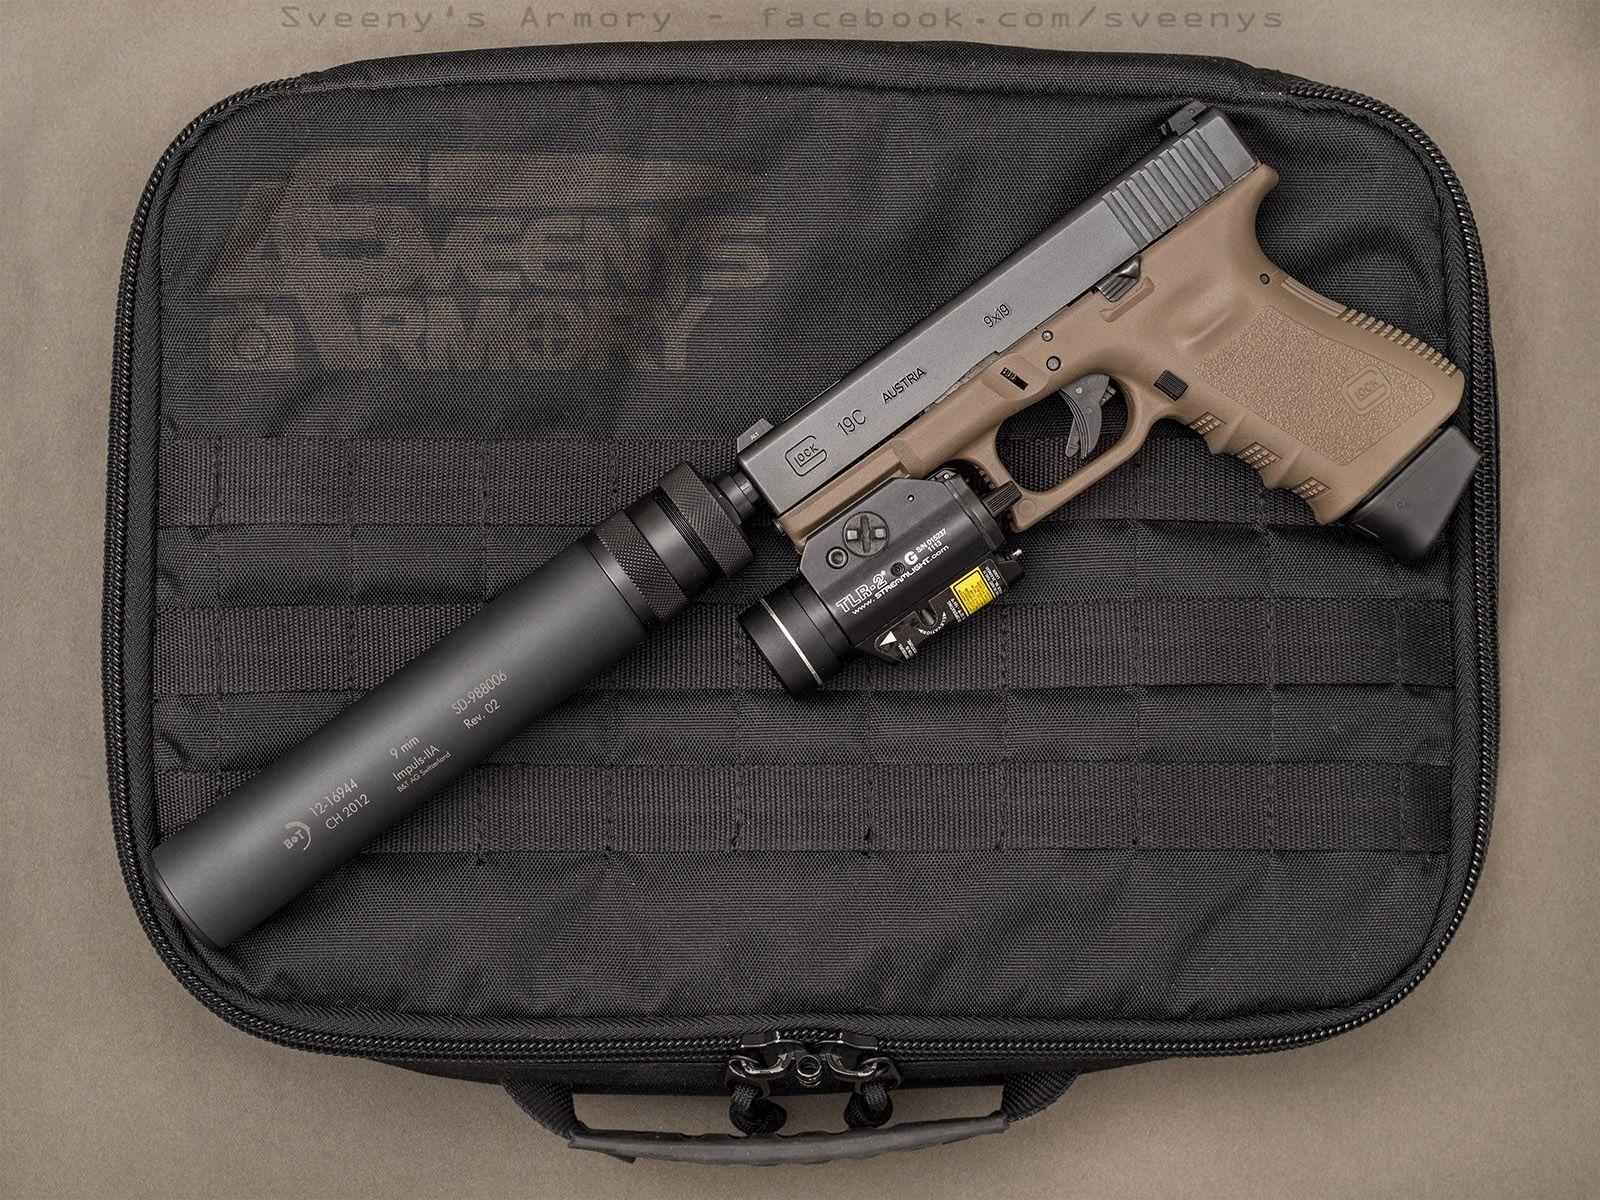 Glock 19 with suppressor and laser/light [1600x1200][OC] | Glock